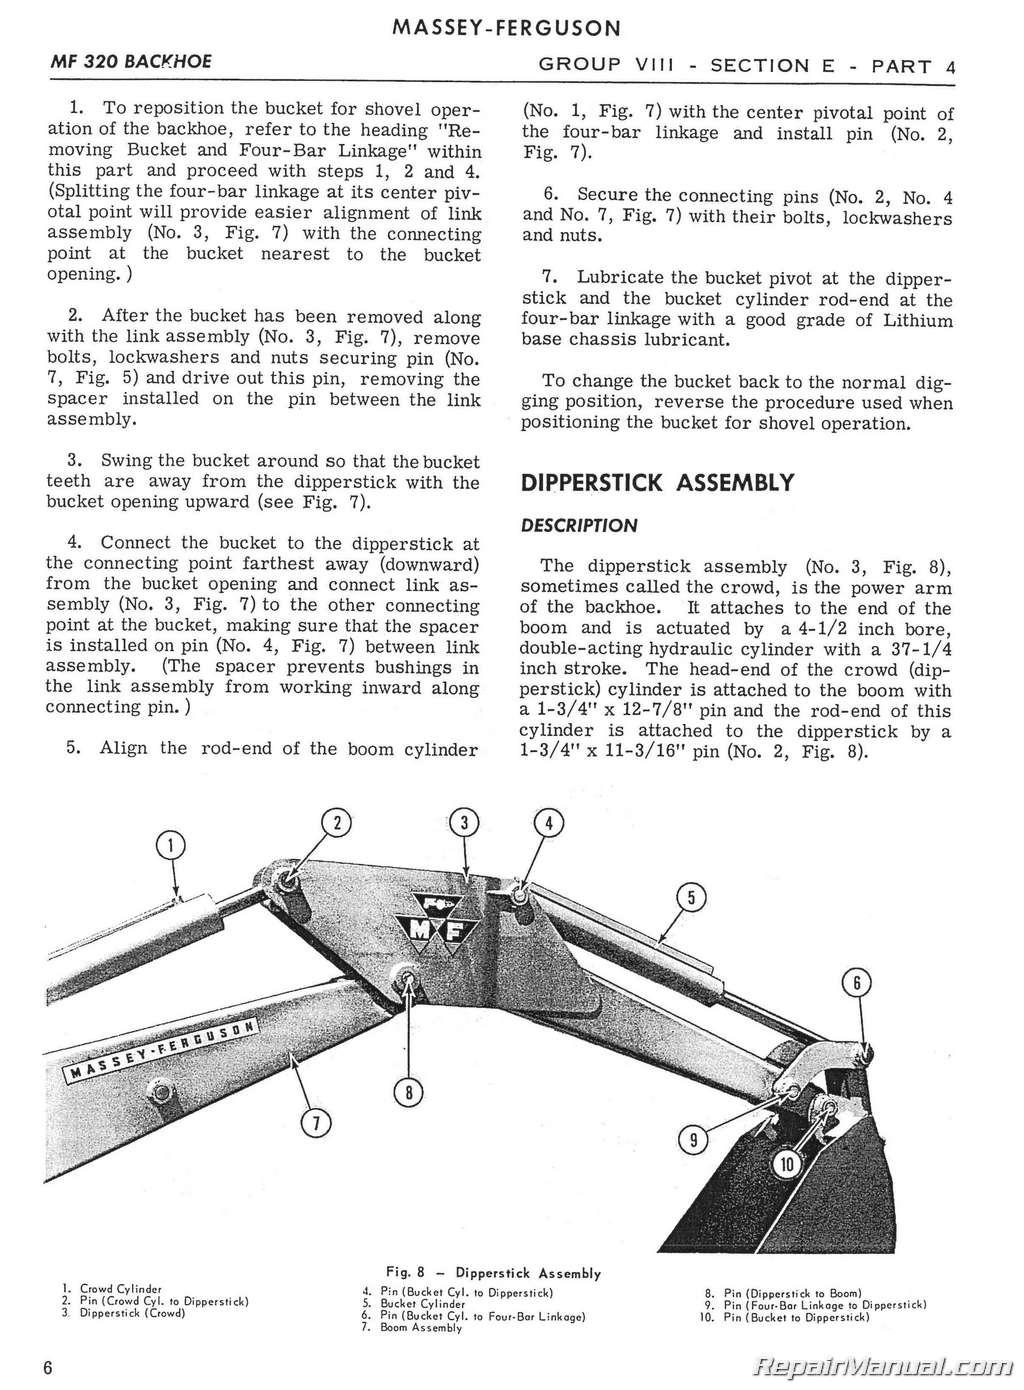 Massey Ferguson 302 Wiring Diagram Diagrams Tractor Alternator Mf 304 320 Backhoe